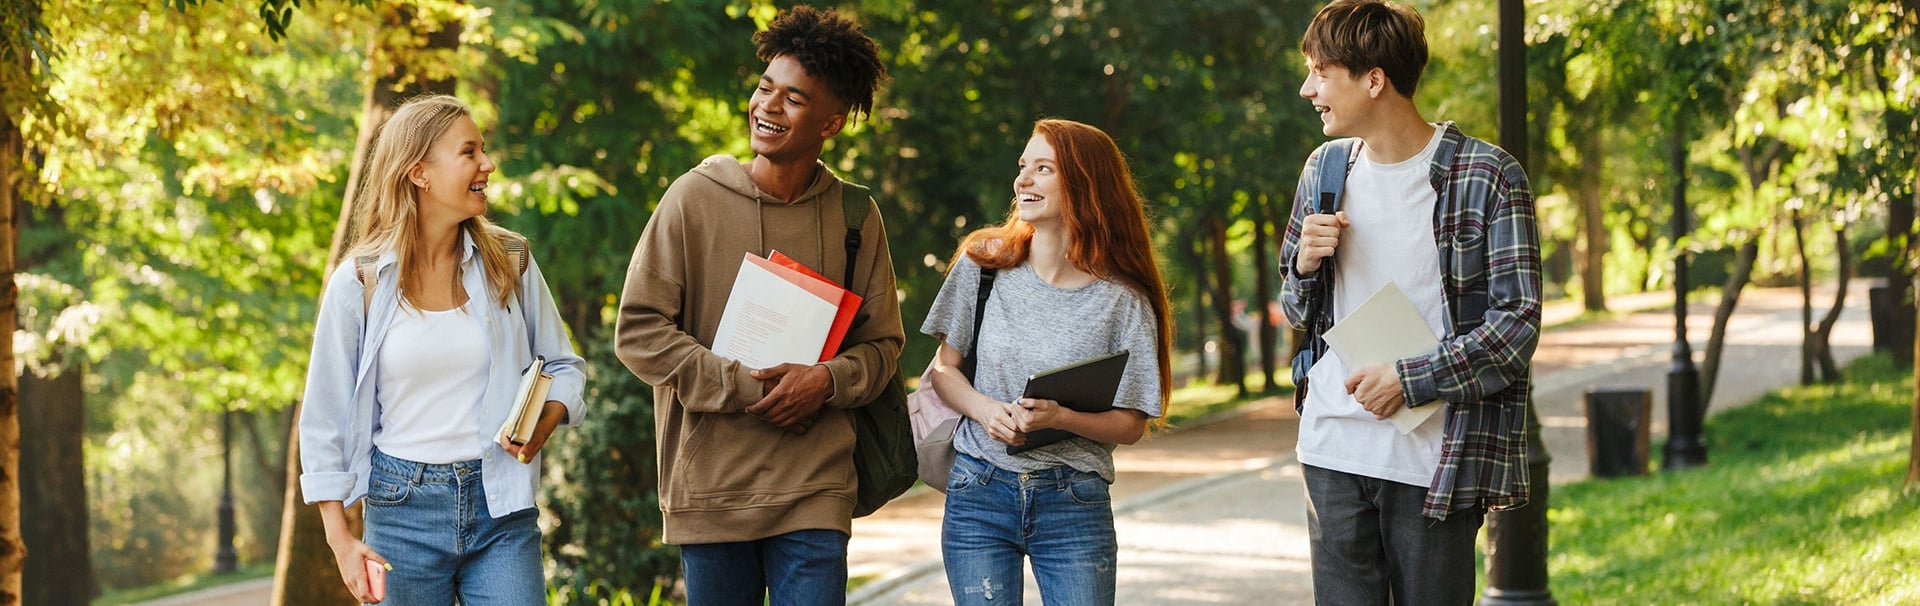 Texas Loan Home Student Loan Slider